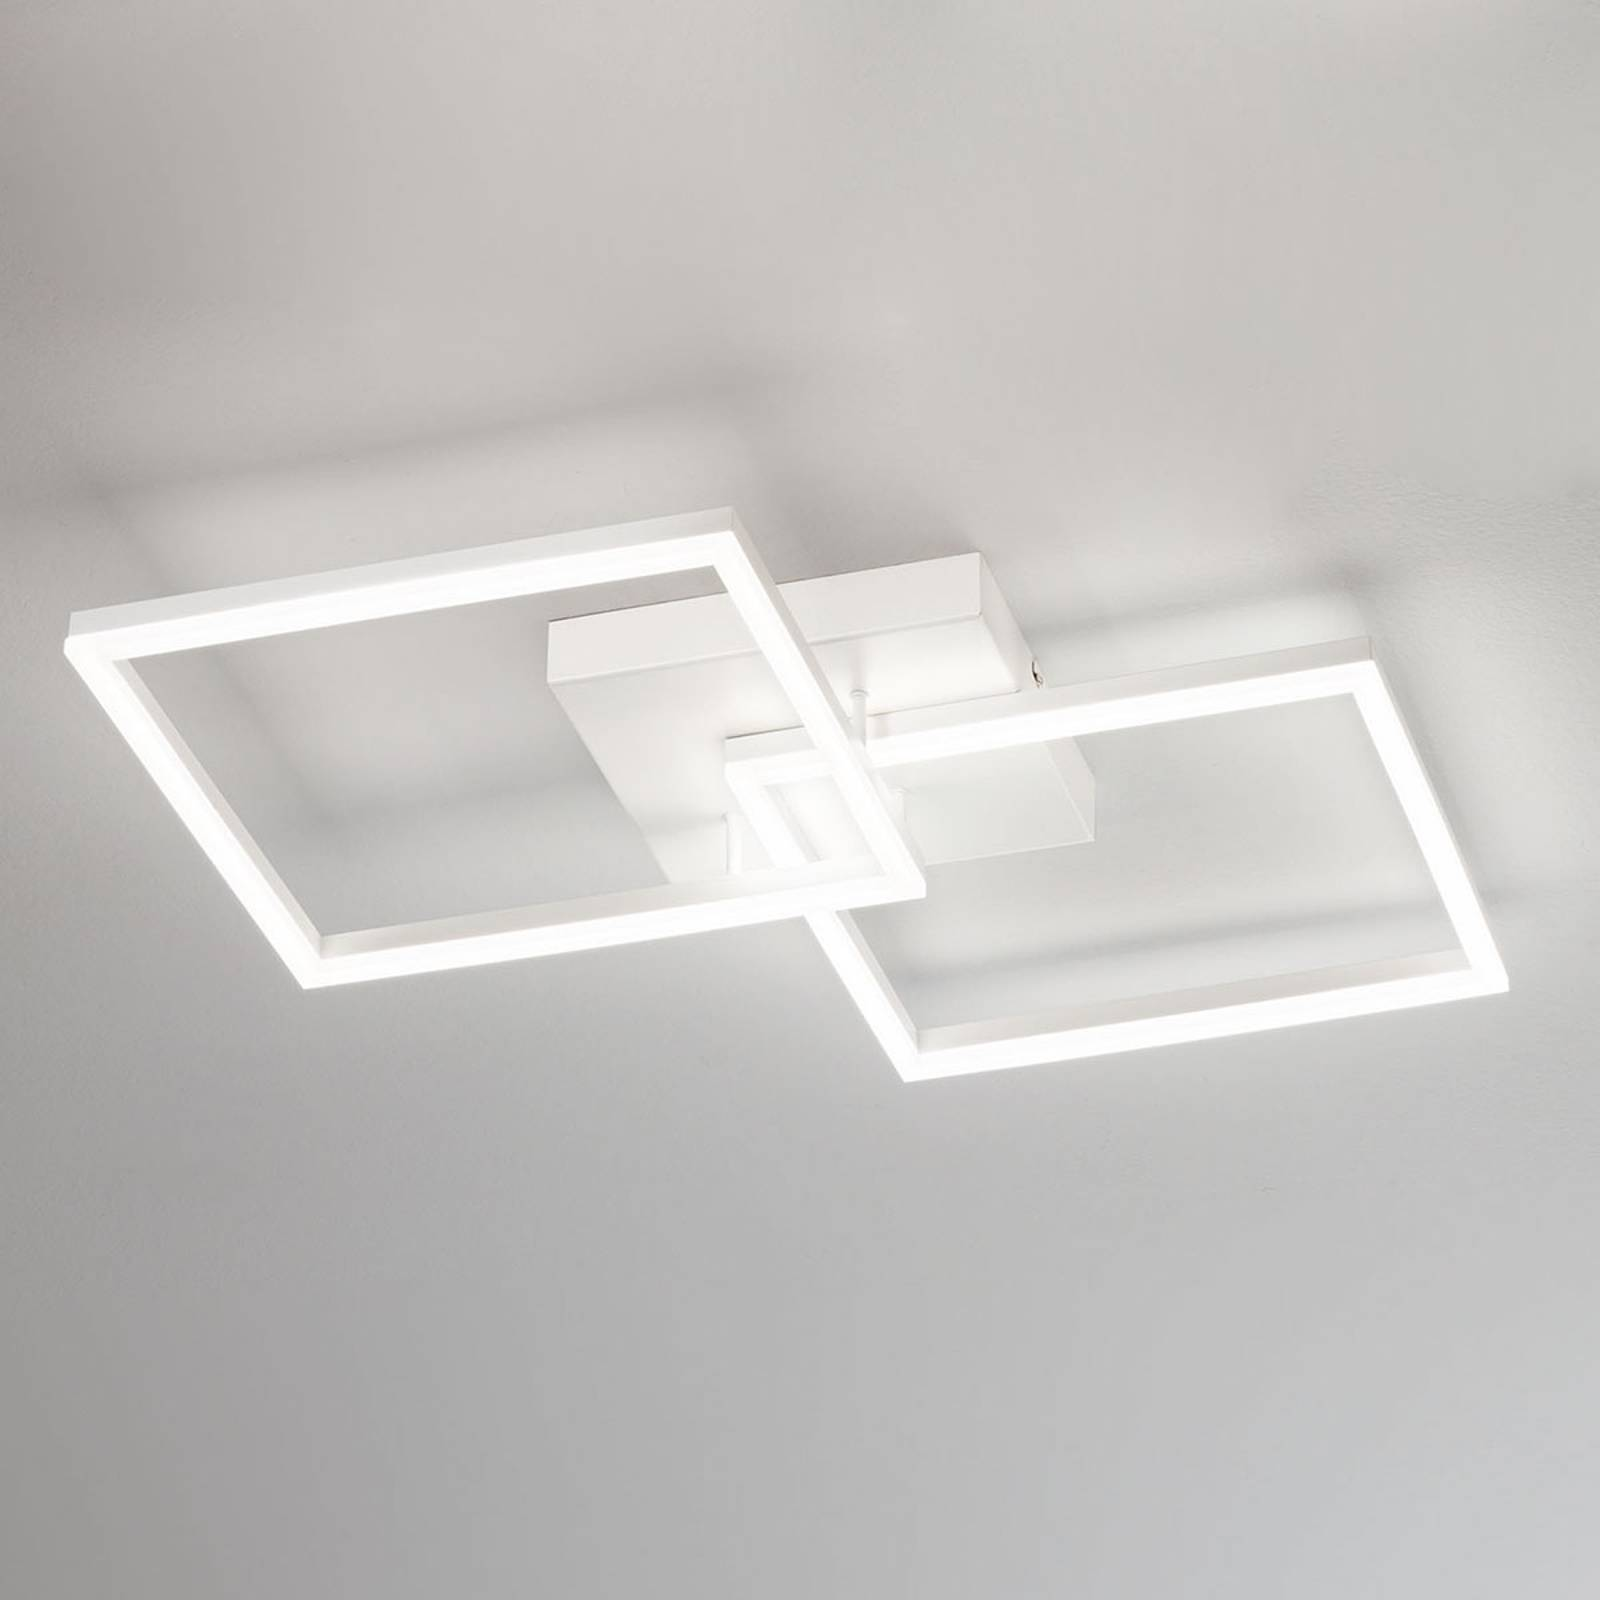 Nowoczesna lampa sufitowa LED Bard, biała